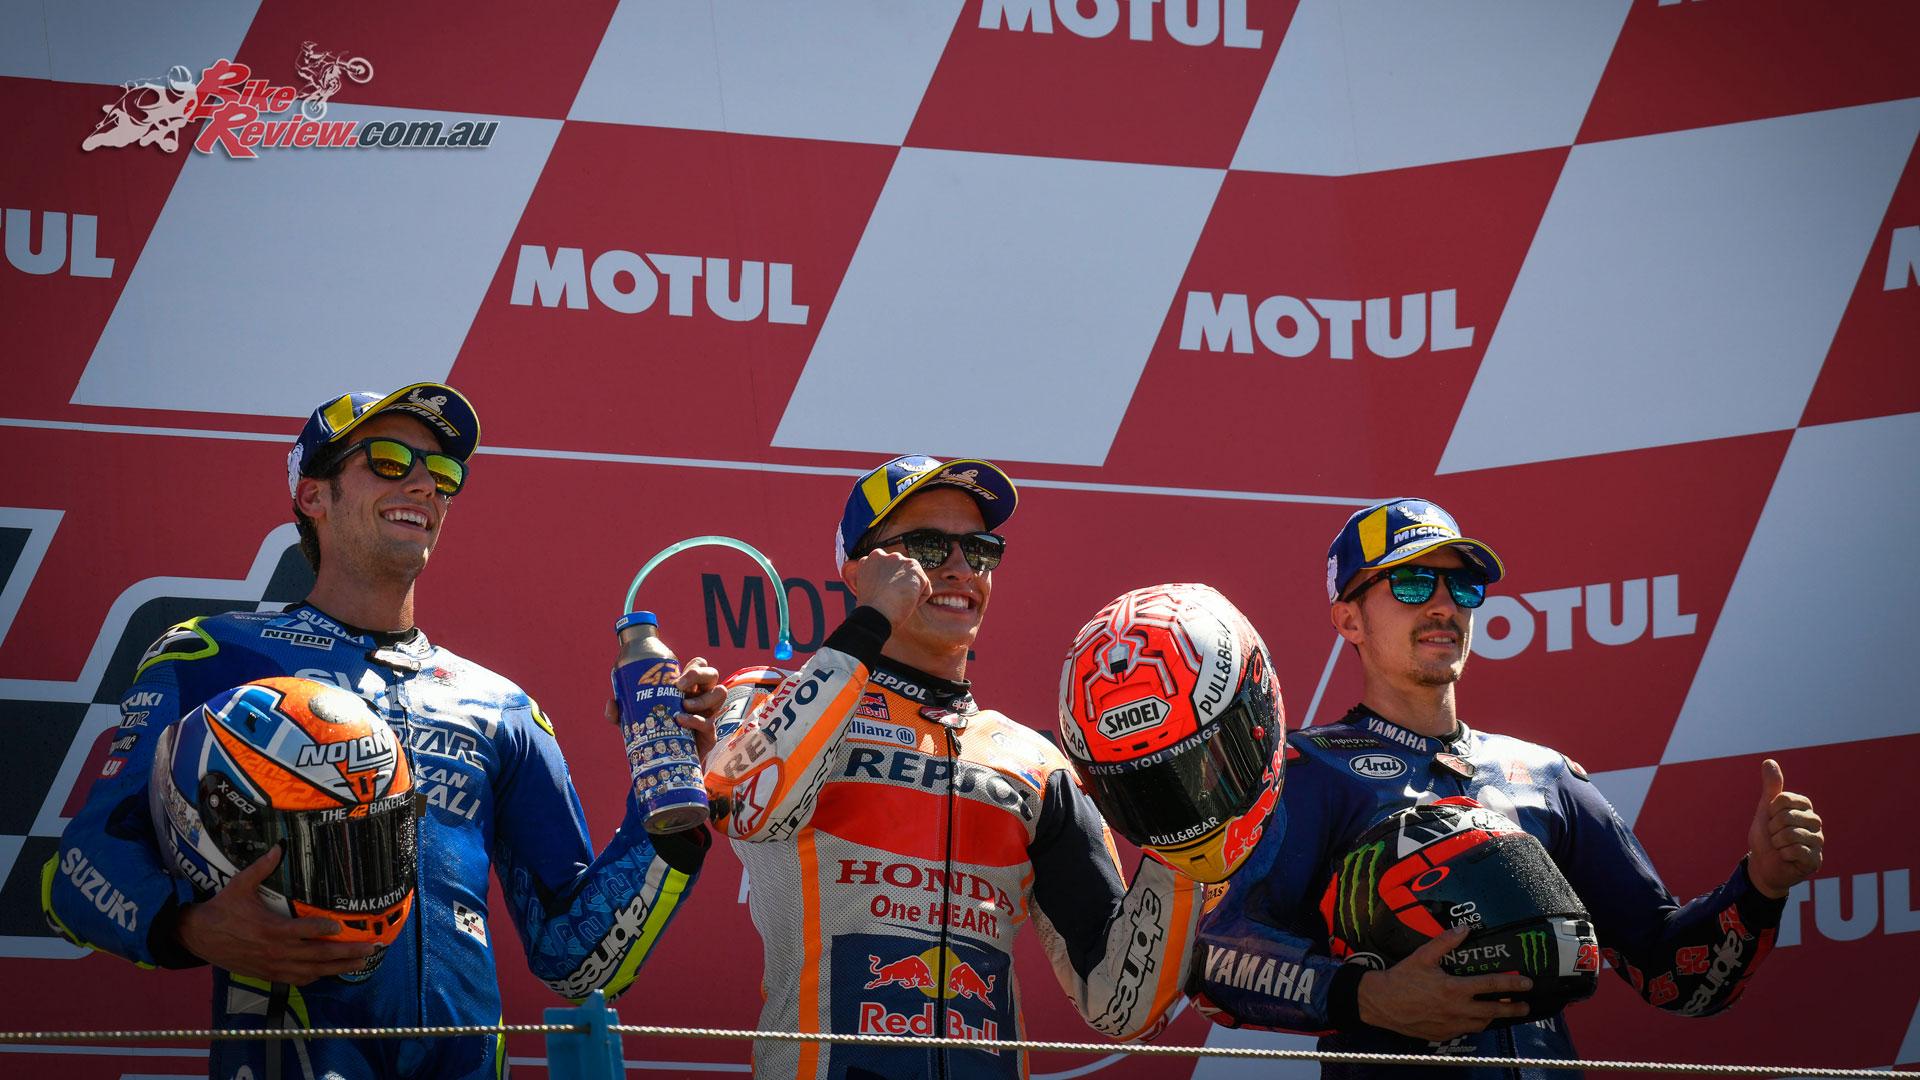 MotoGP 2018 - Assen - Podium